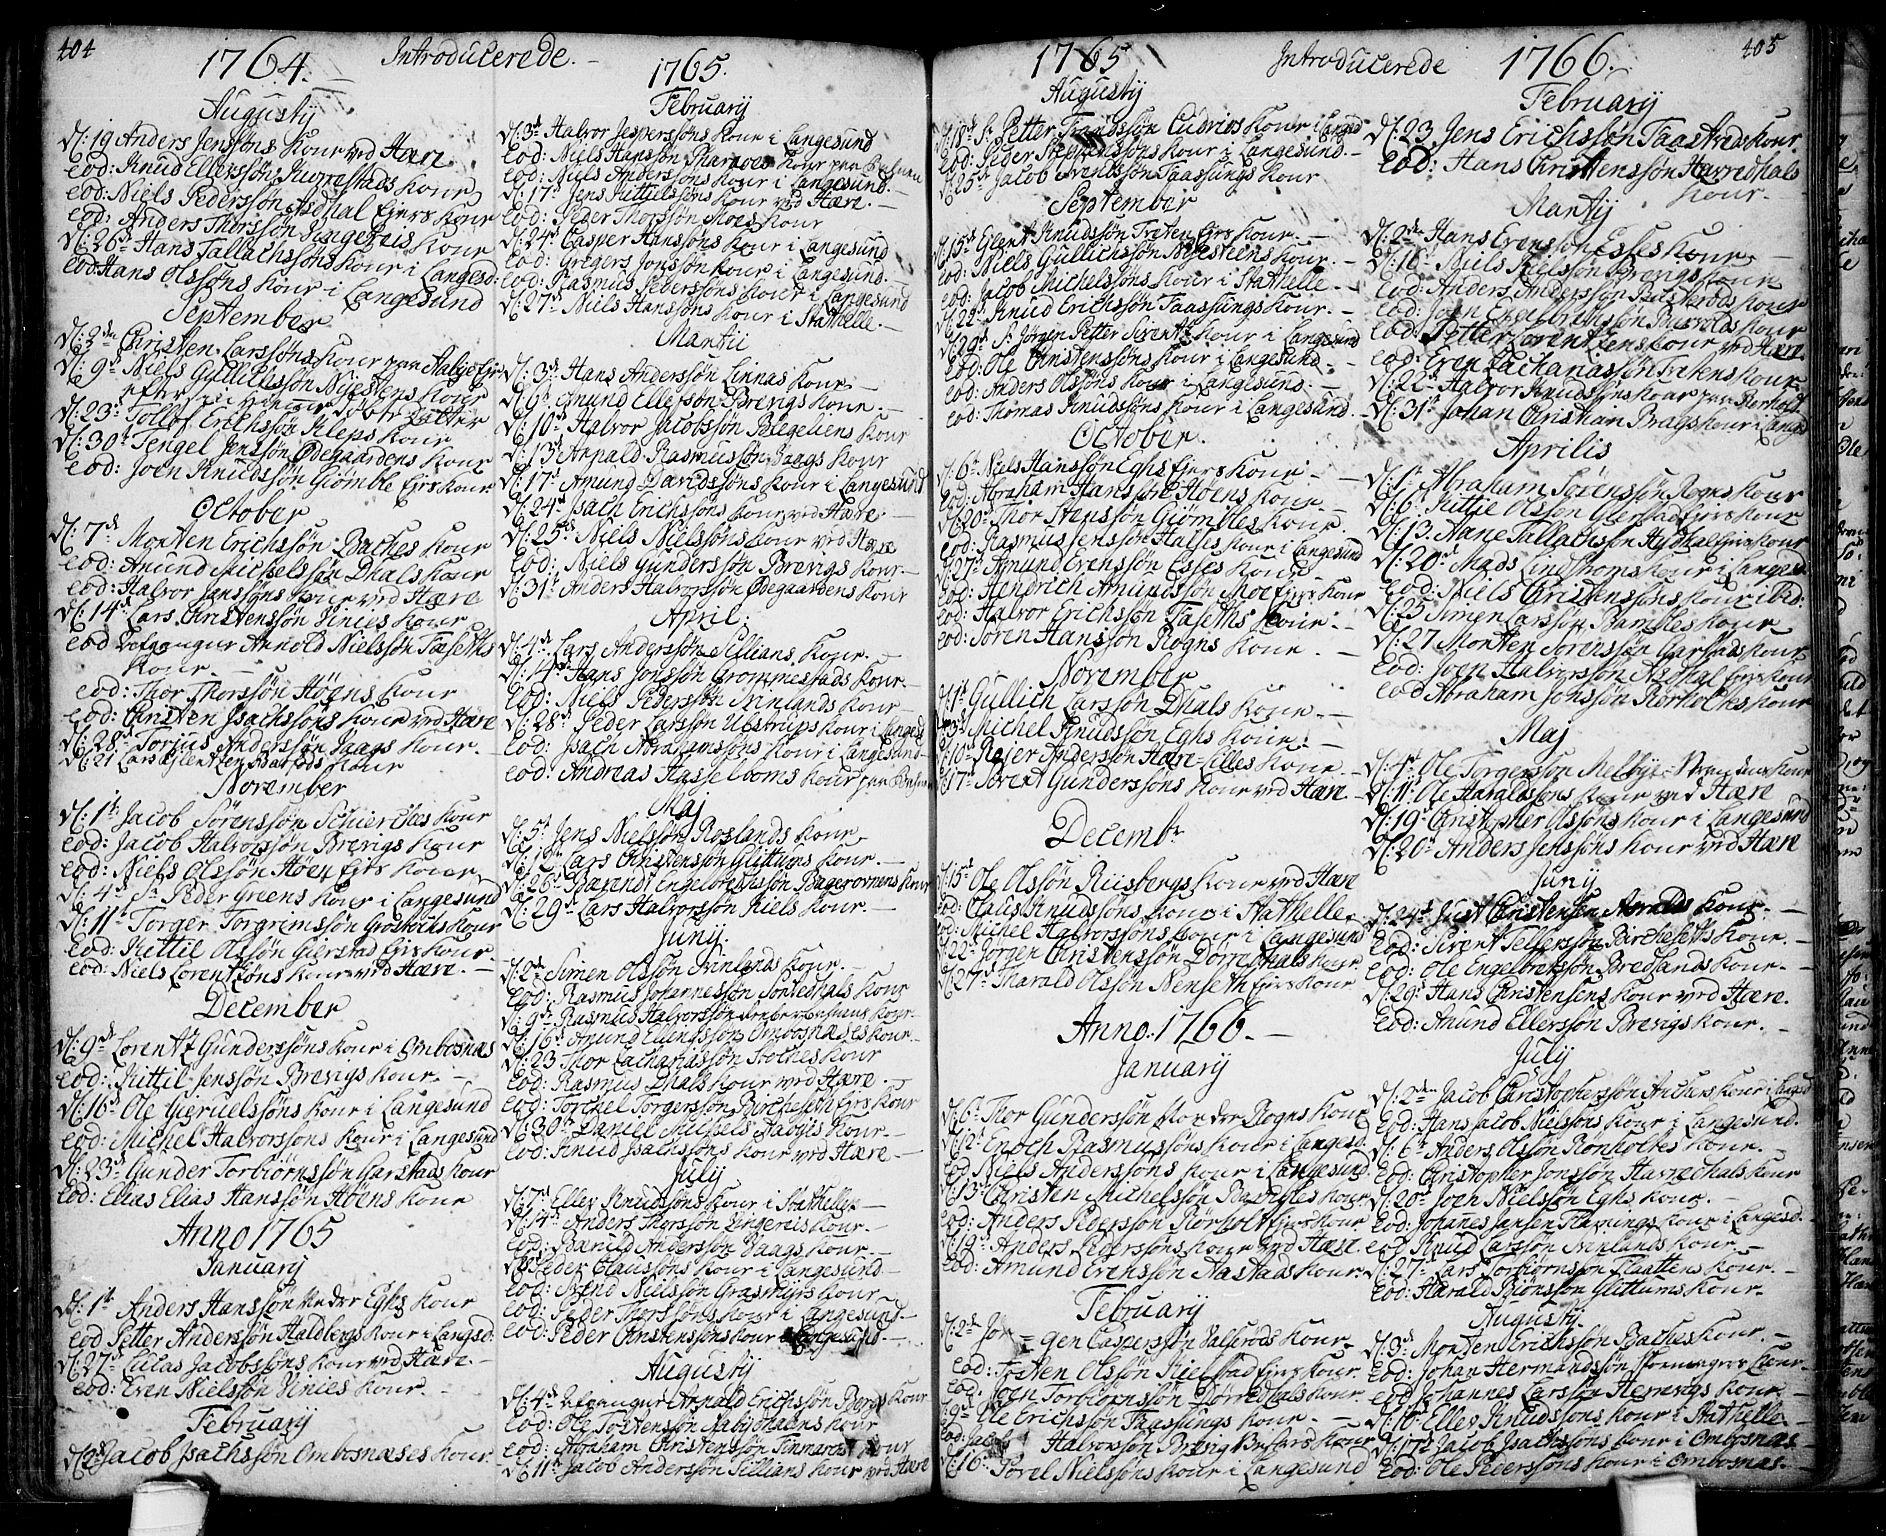 SAKO, Bamble kirkebøker, F/Fa/L0001: Ministerialbok nr. I 1, 1702-1774, s. 404-405